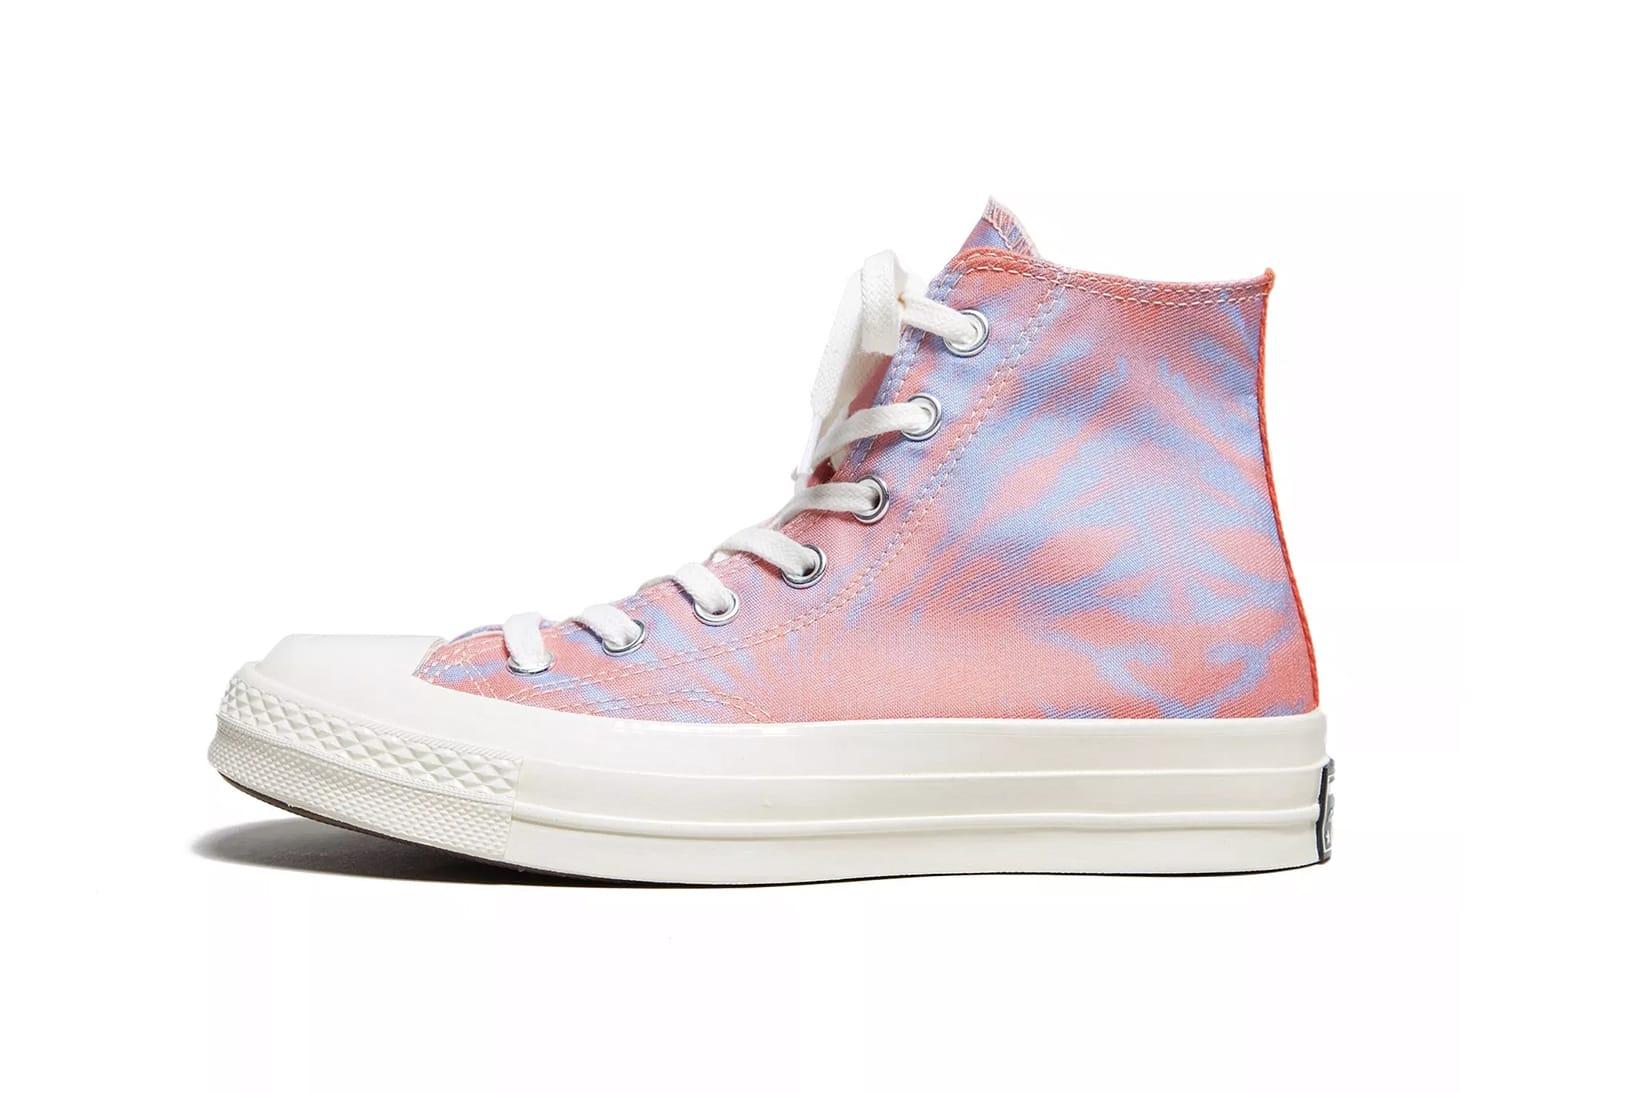 Converse Chuck Taylor Tie-Dye Pink